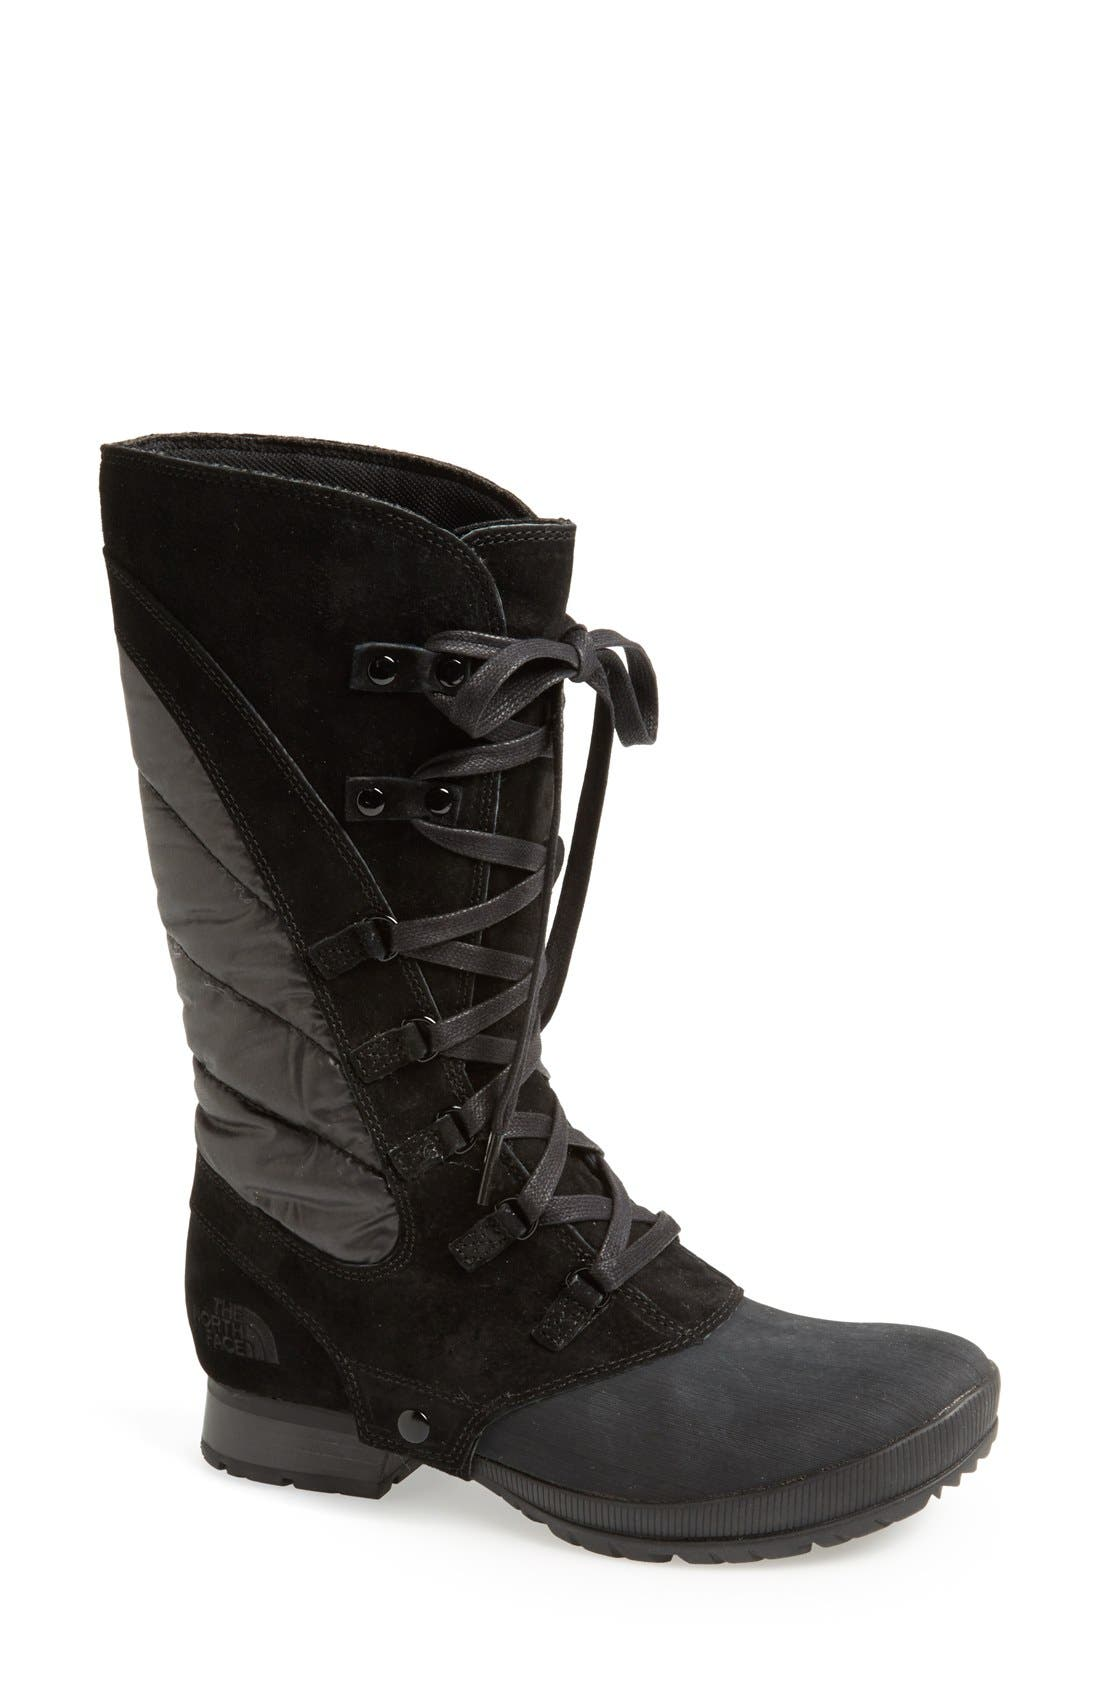 Main Image - The North Face 'Zophia' Waterproof Boot (Women)